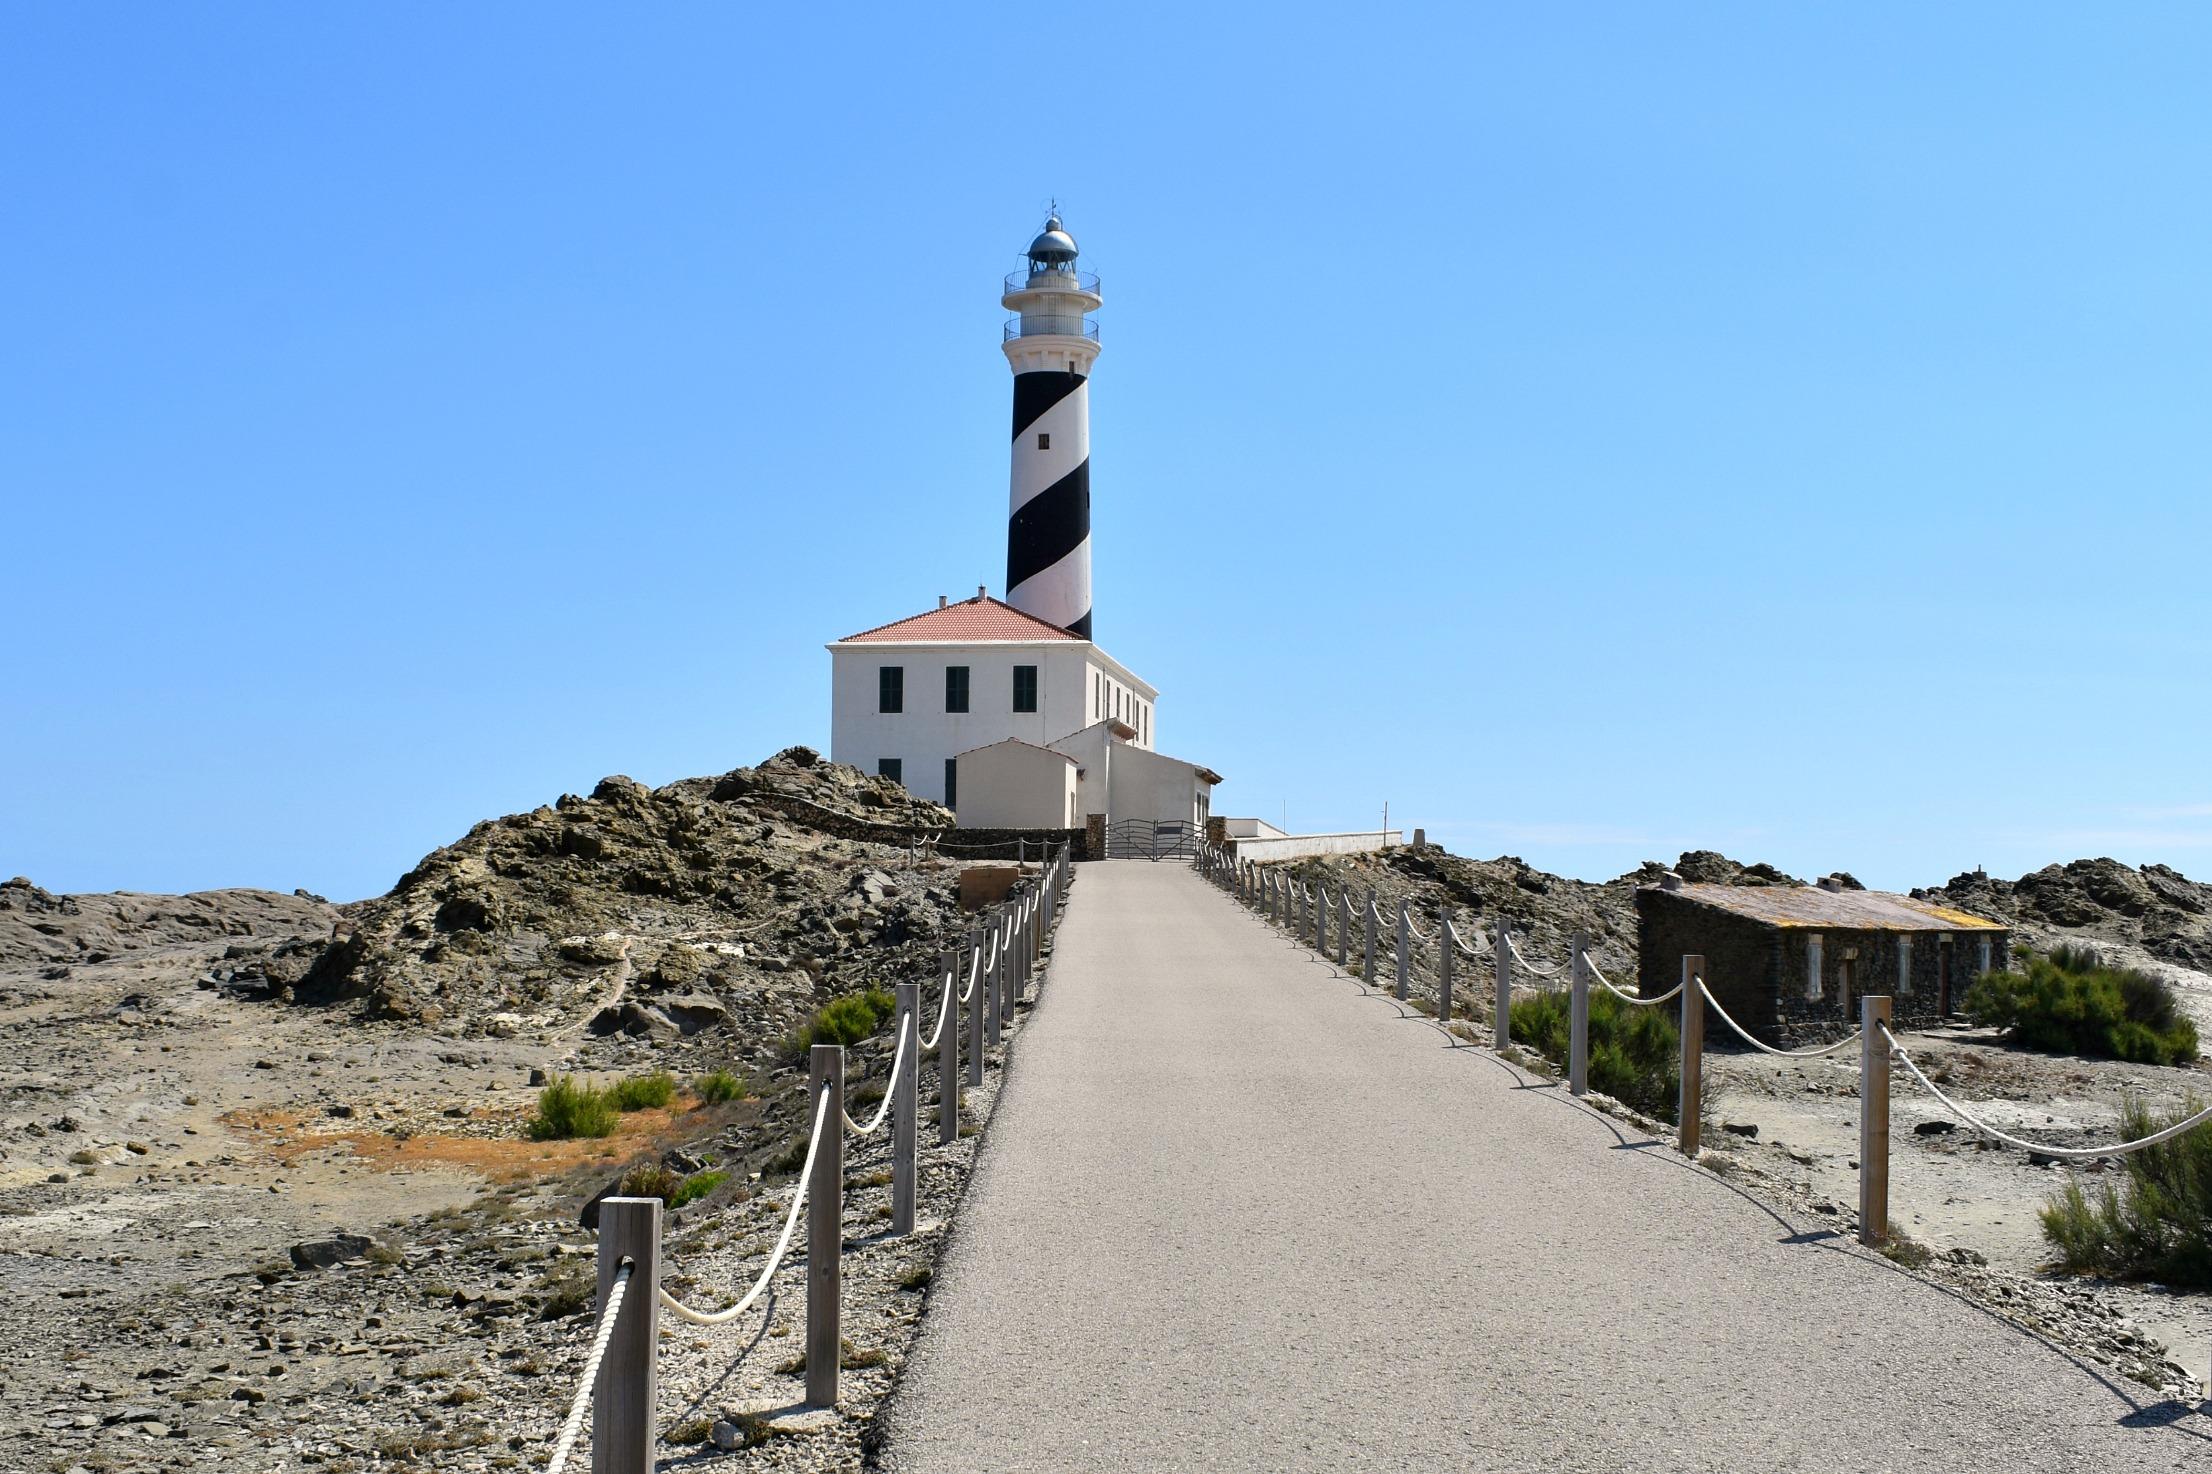 Menorca Favaritx Lighthouse